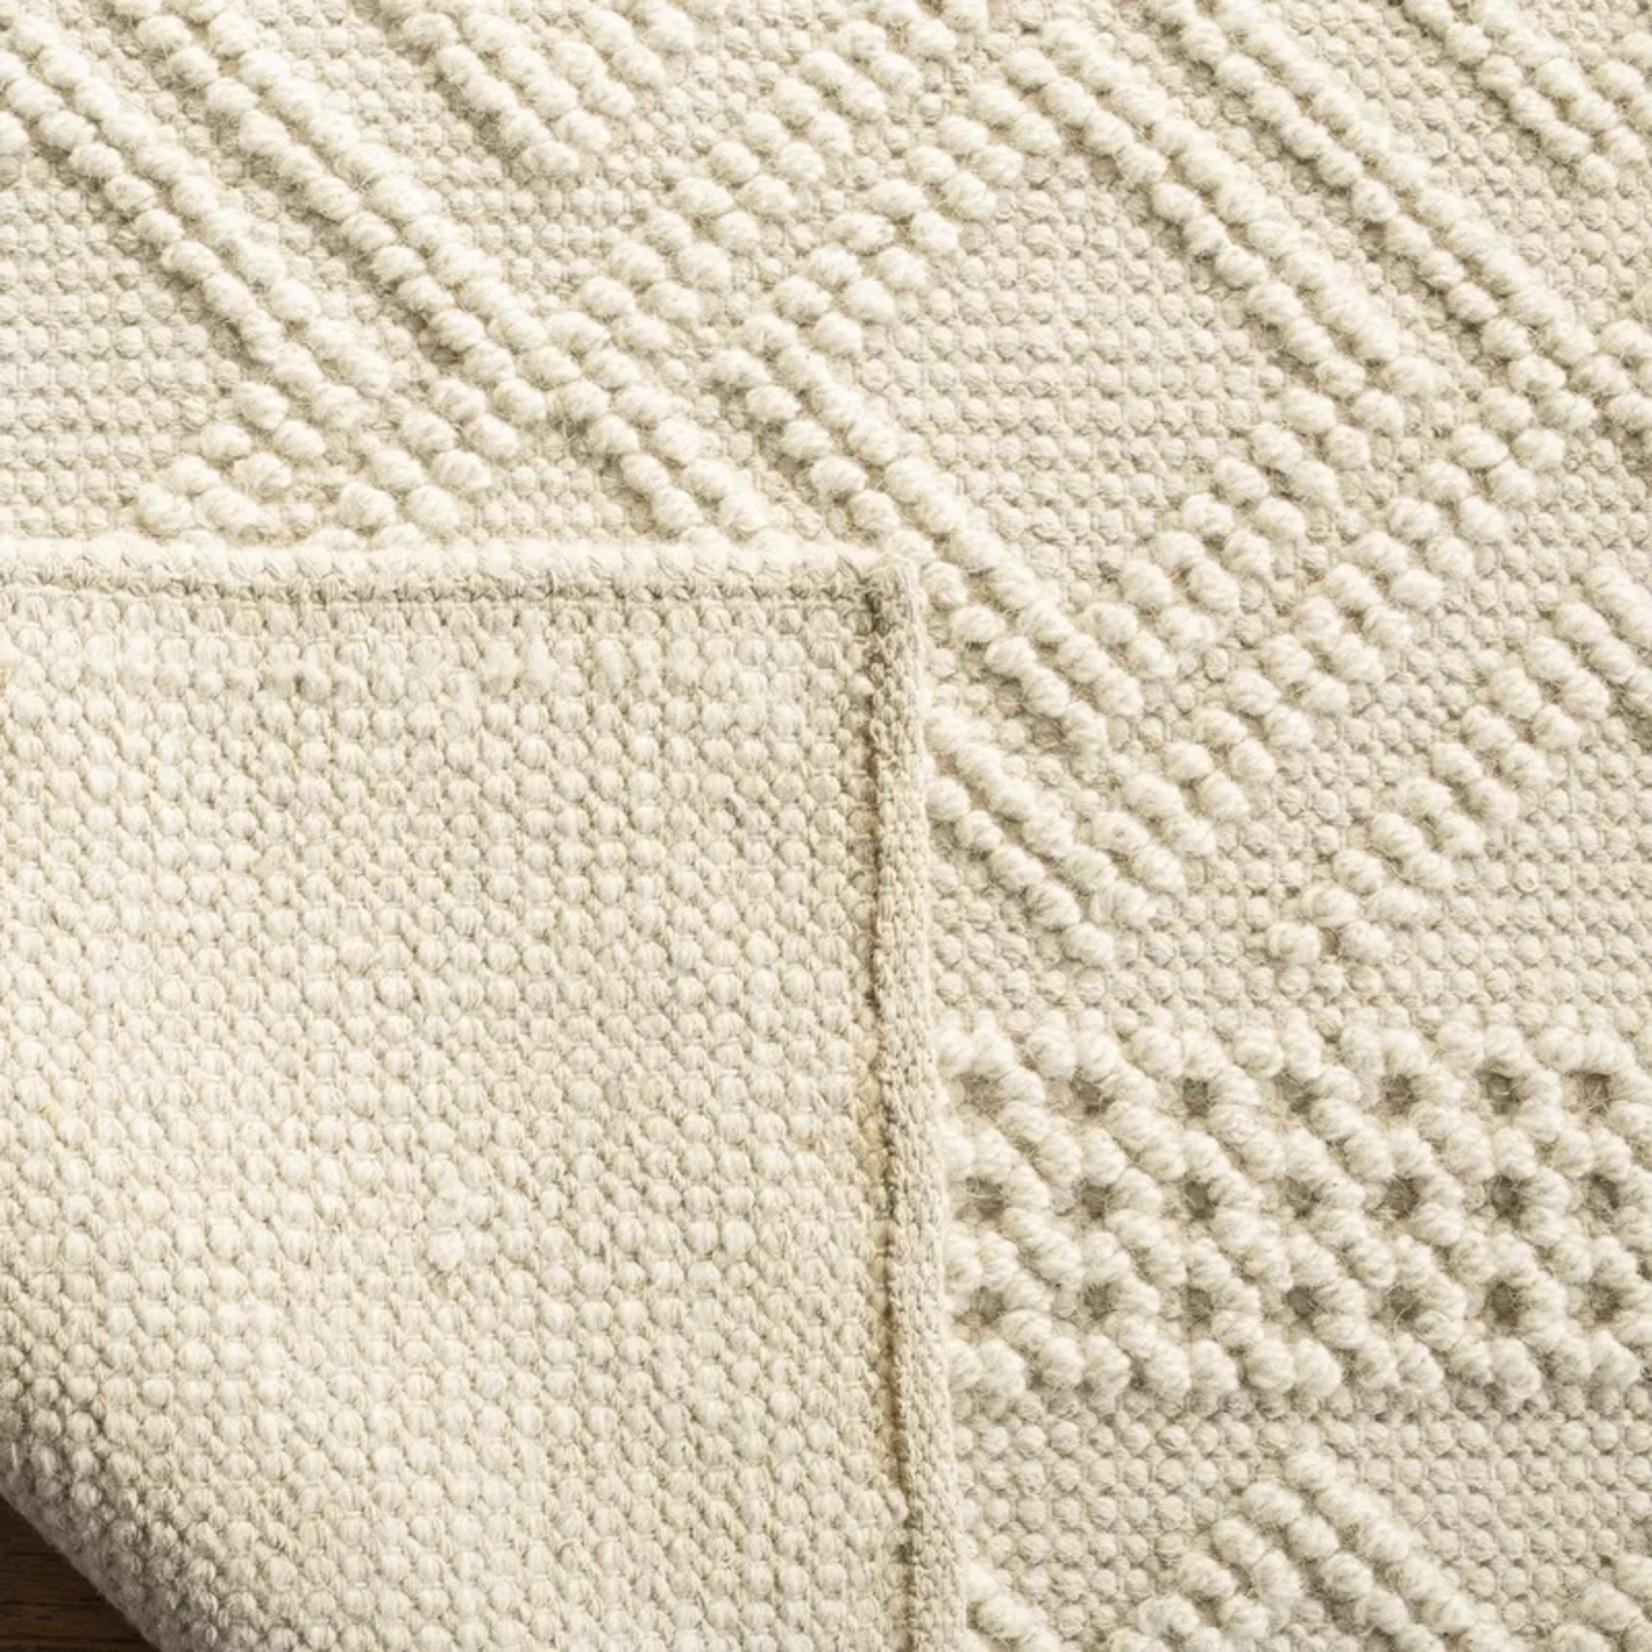 *4' x 6' - Xamiera Hand-Tufted Wool/Cotton Ivory Area Rug